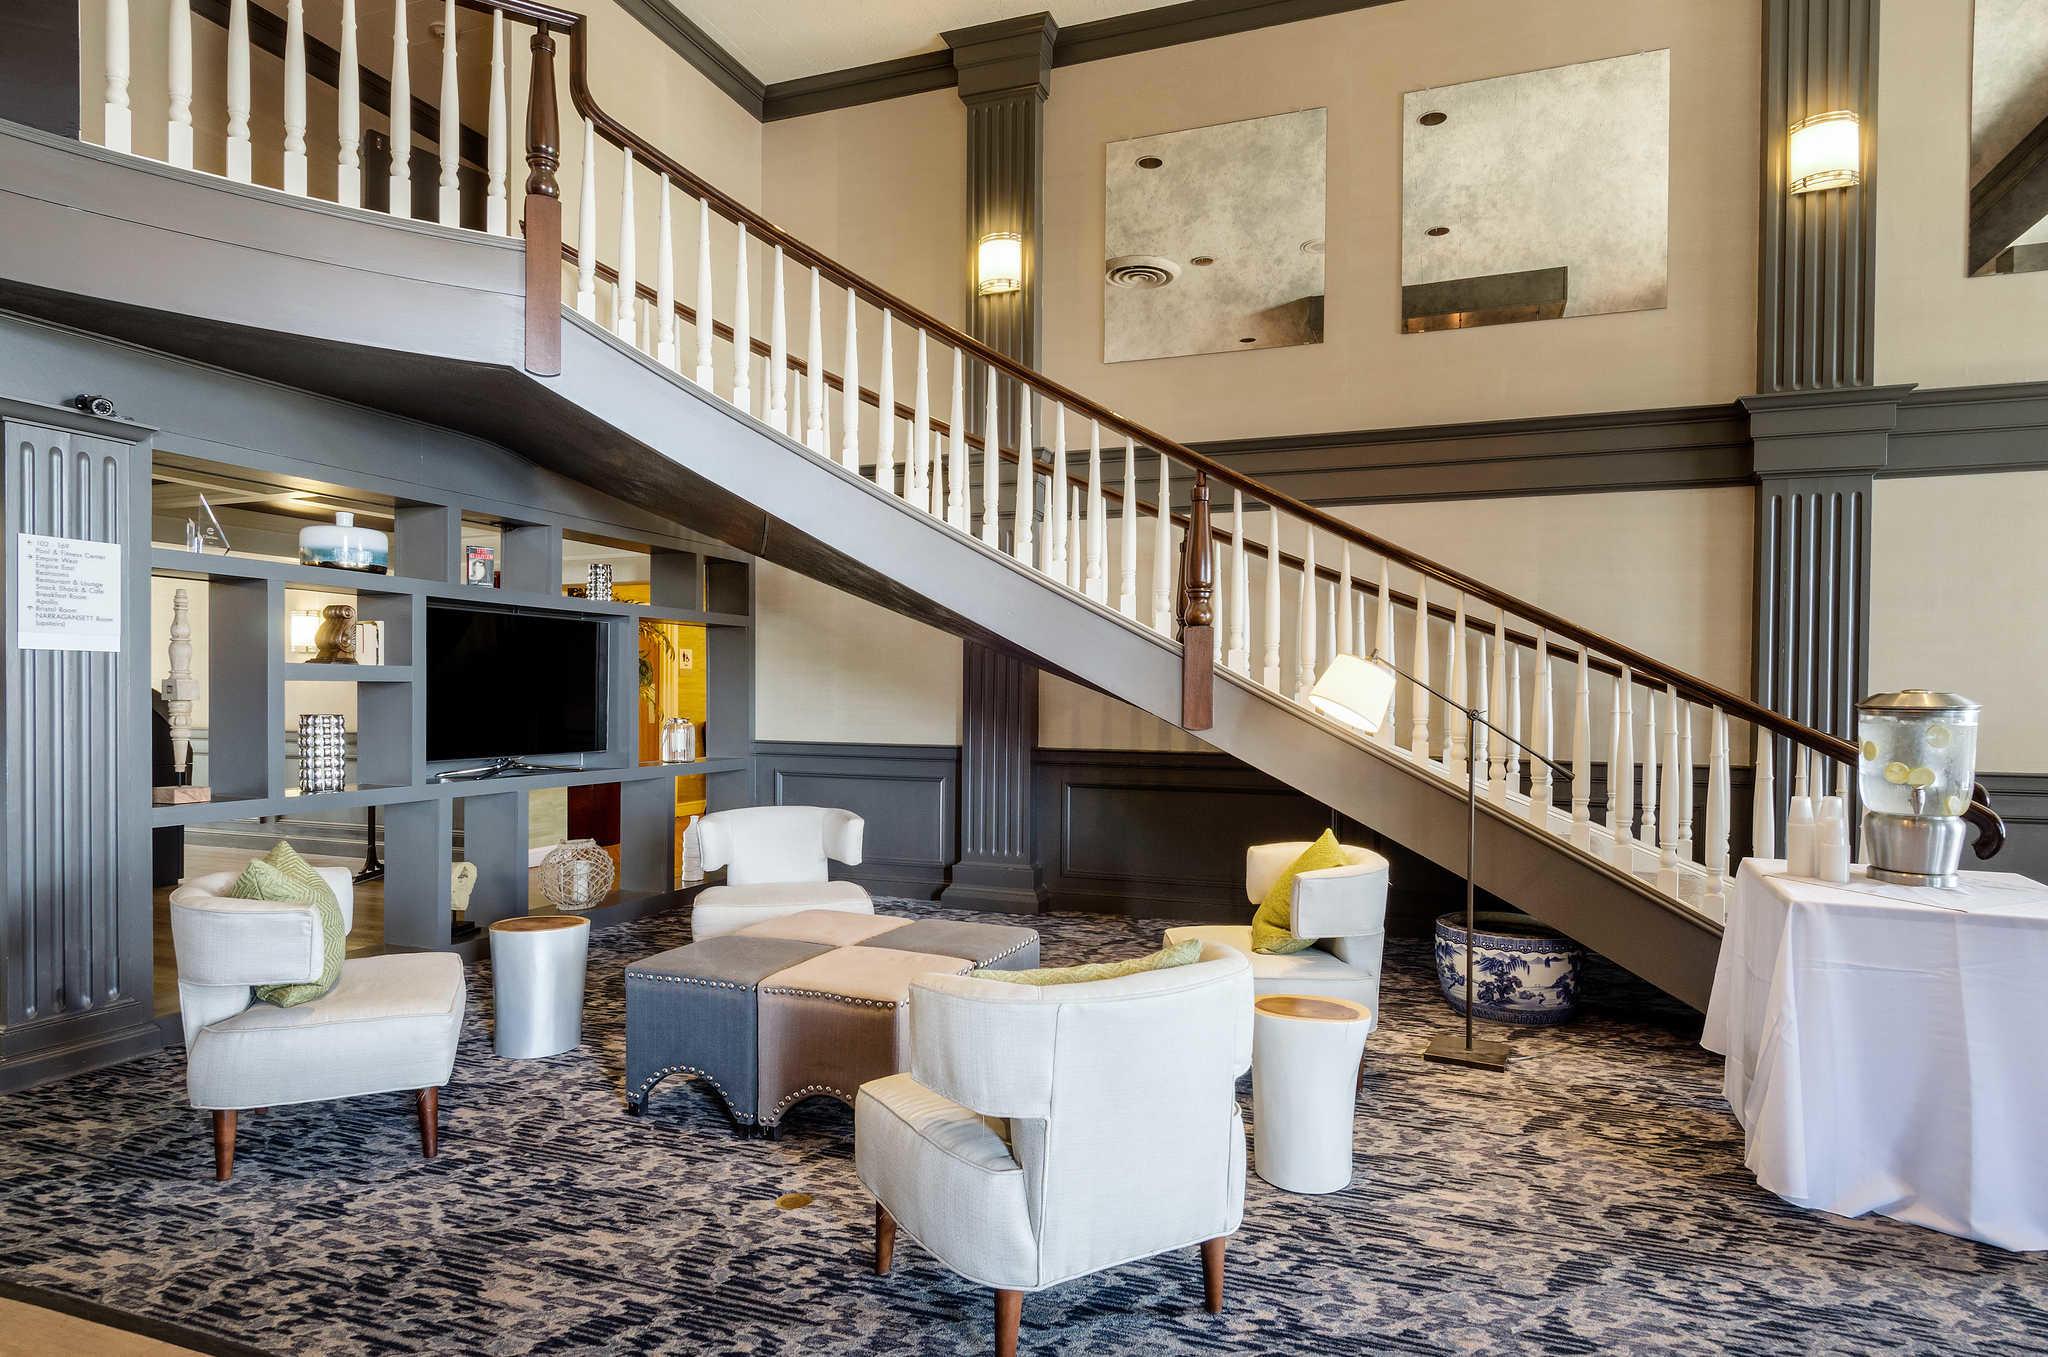 Clarion Inn Seekonk - Providence image 4